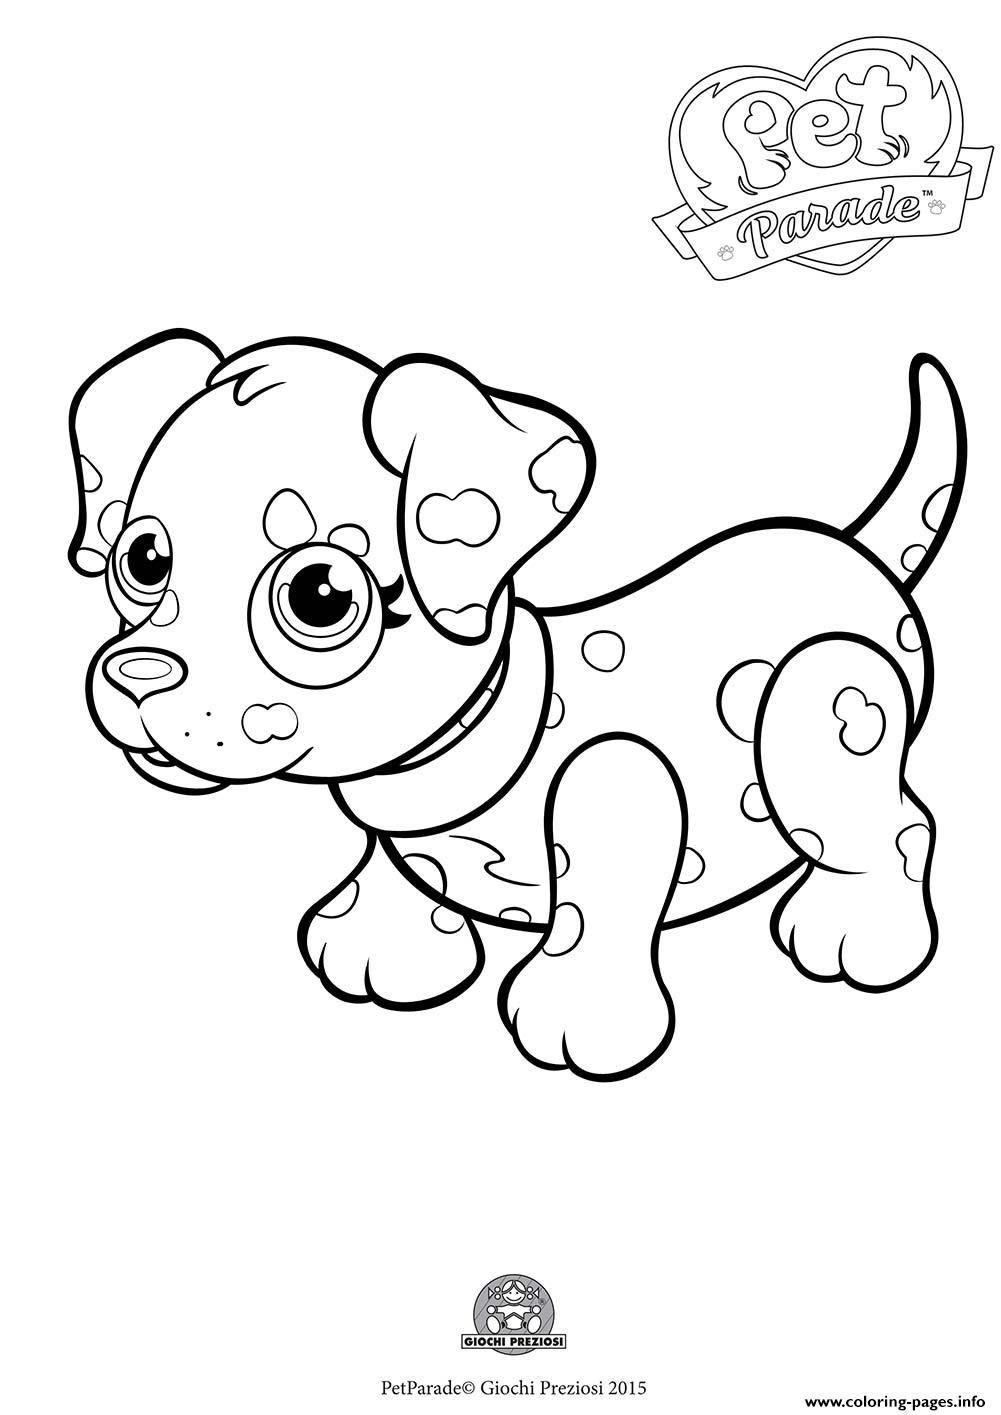 Dalmatian Dog Coloring Page - Coloring Home